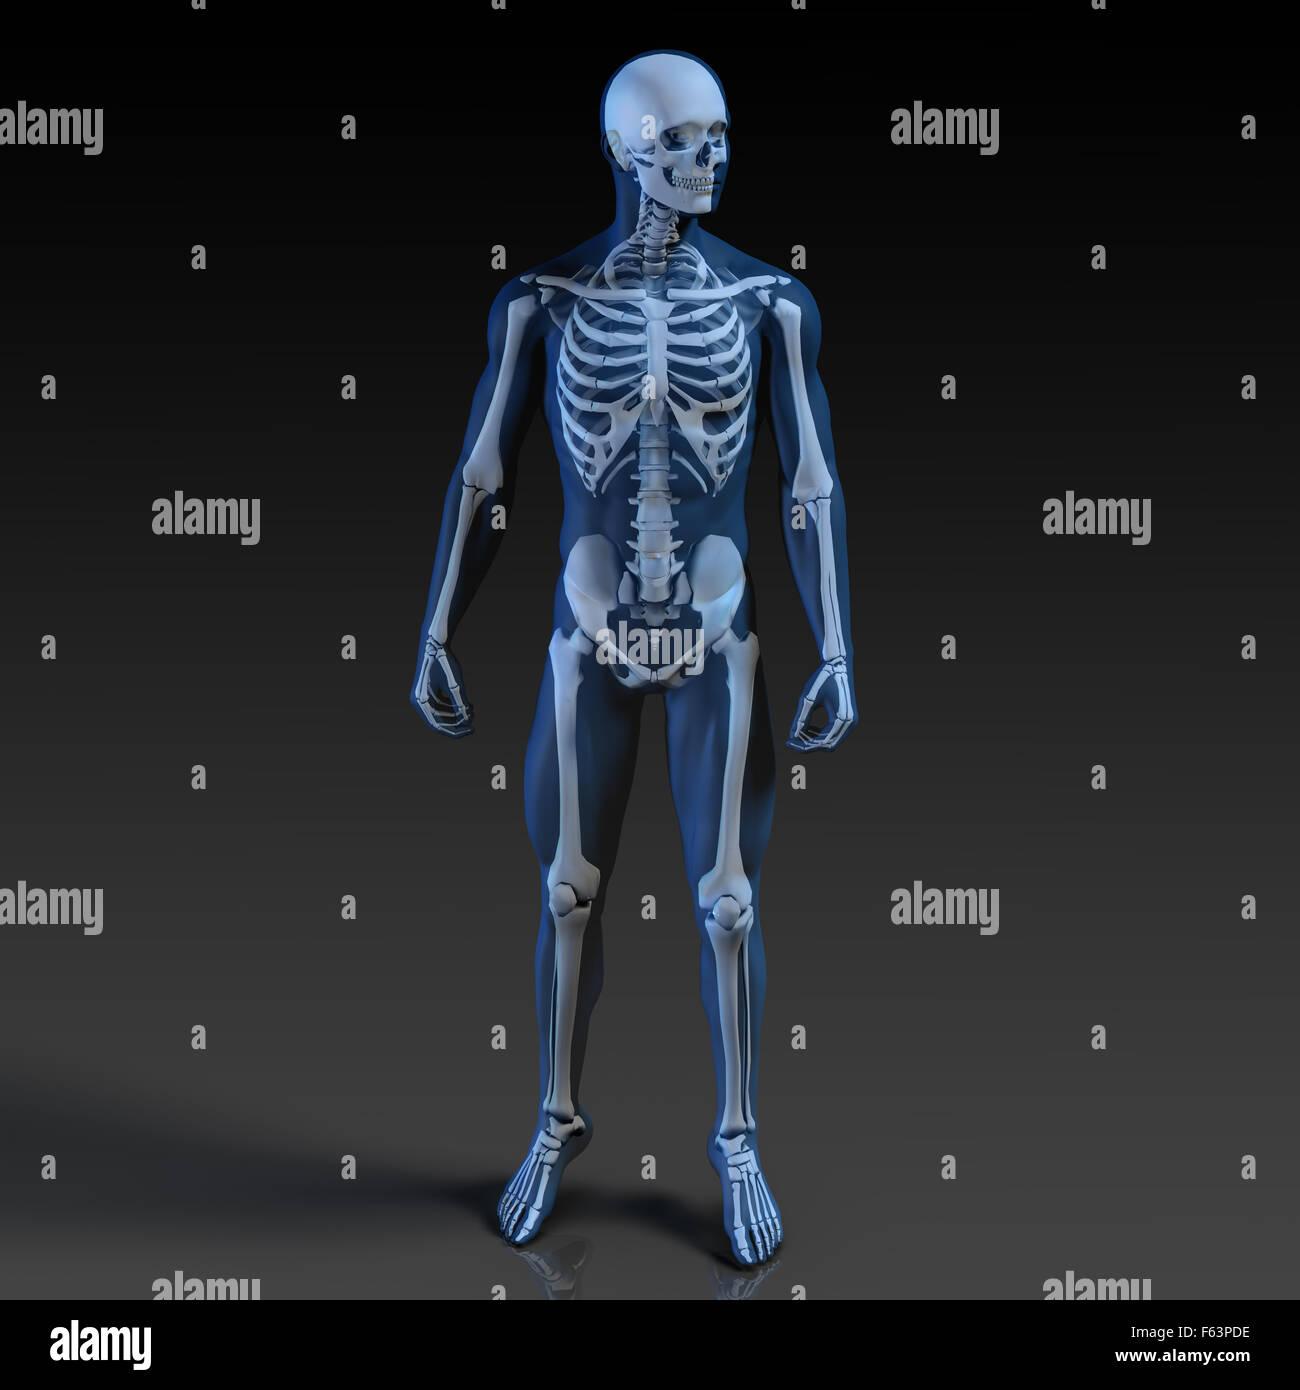 Skeleton Dummy Stock Photos & Skeleton Dummy Stock Images - Alamy